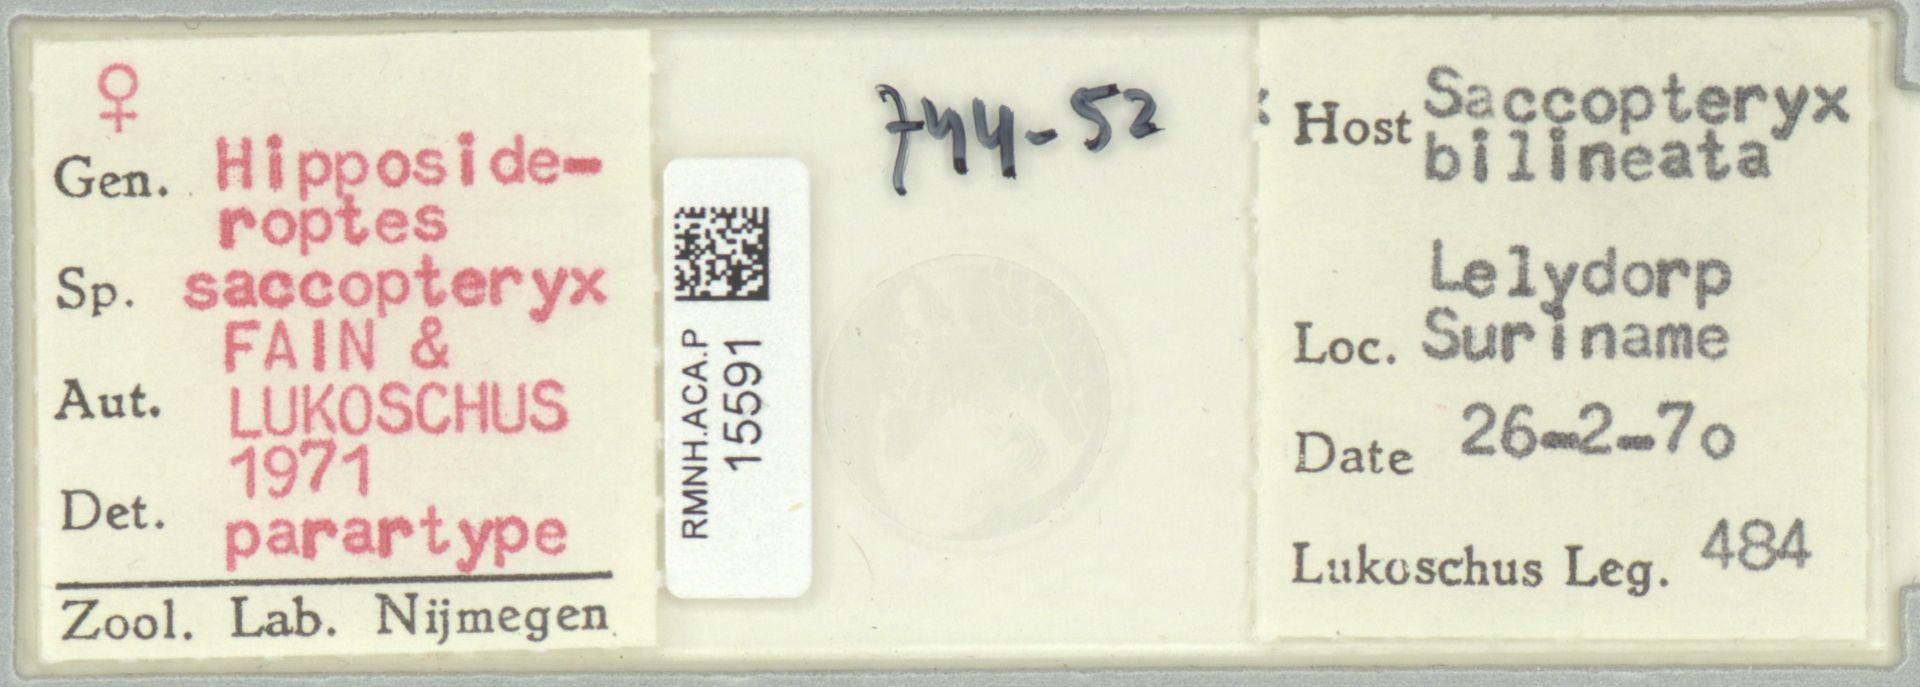 RMNH.ACA.P.15591 | Hipposideroptes saccopteryx